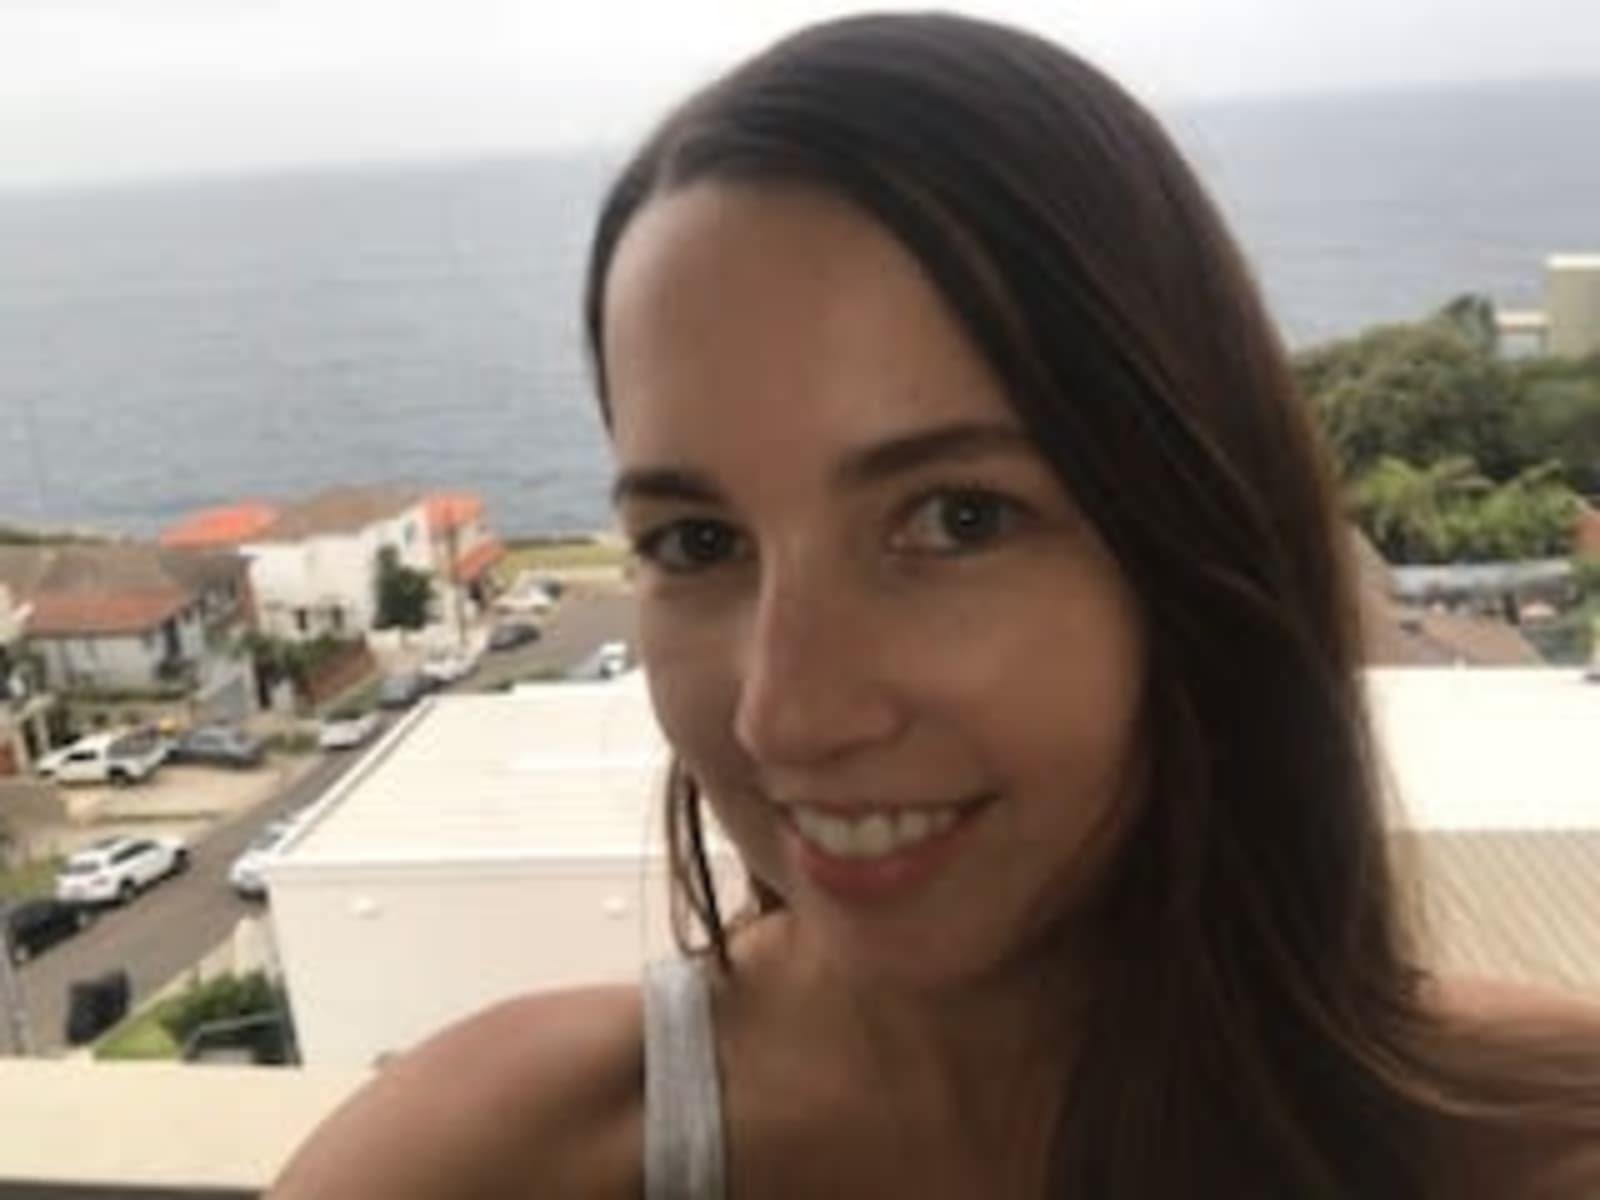 Melissa from Sydney, New South Wales, Australia